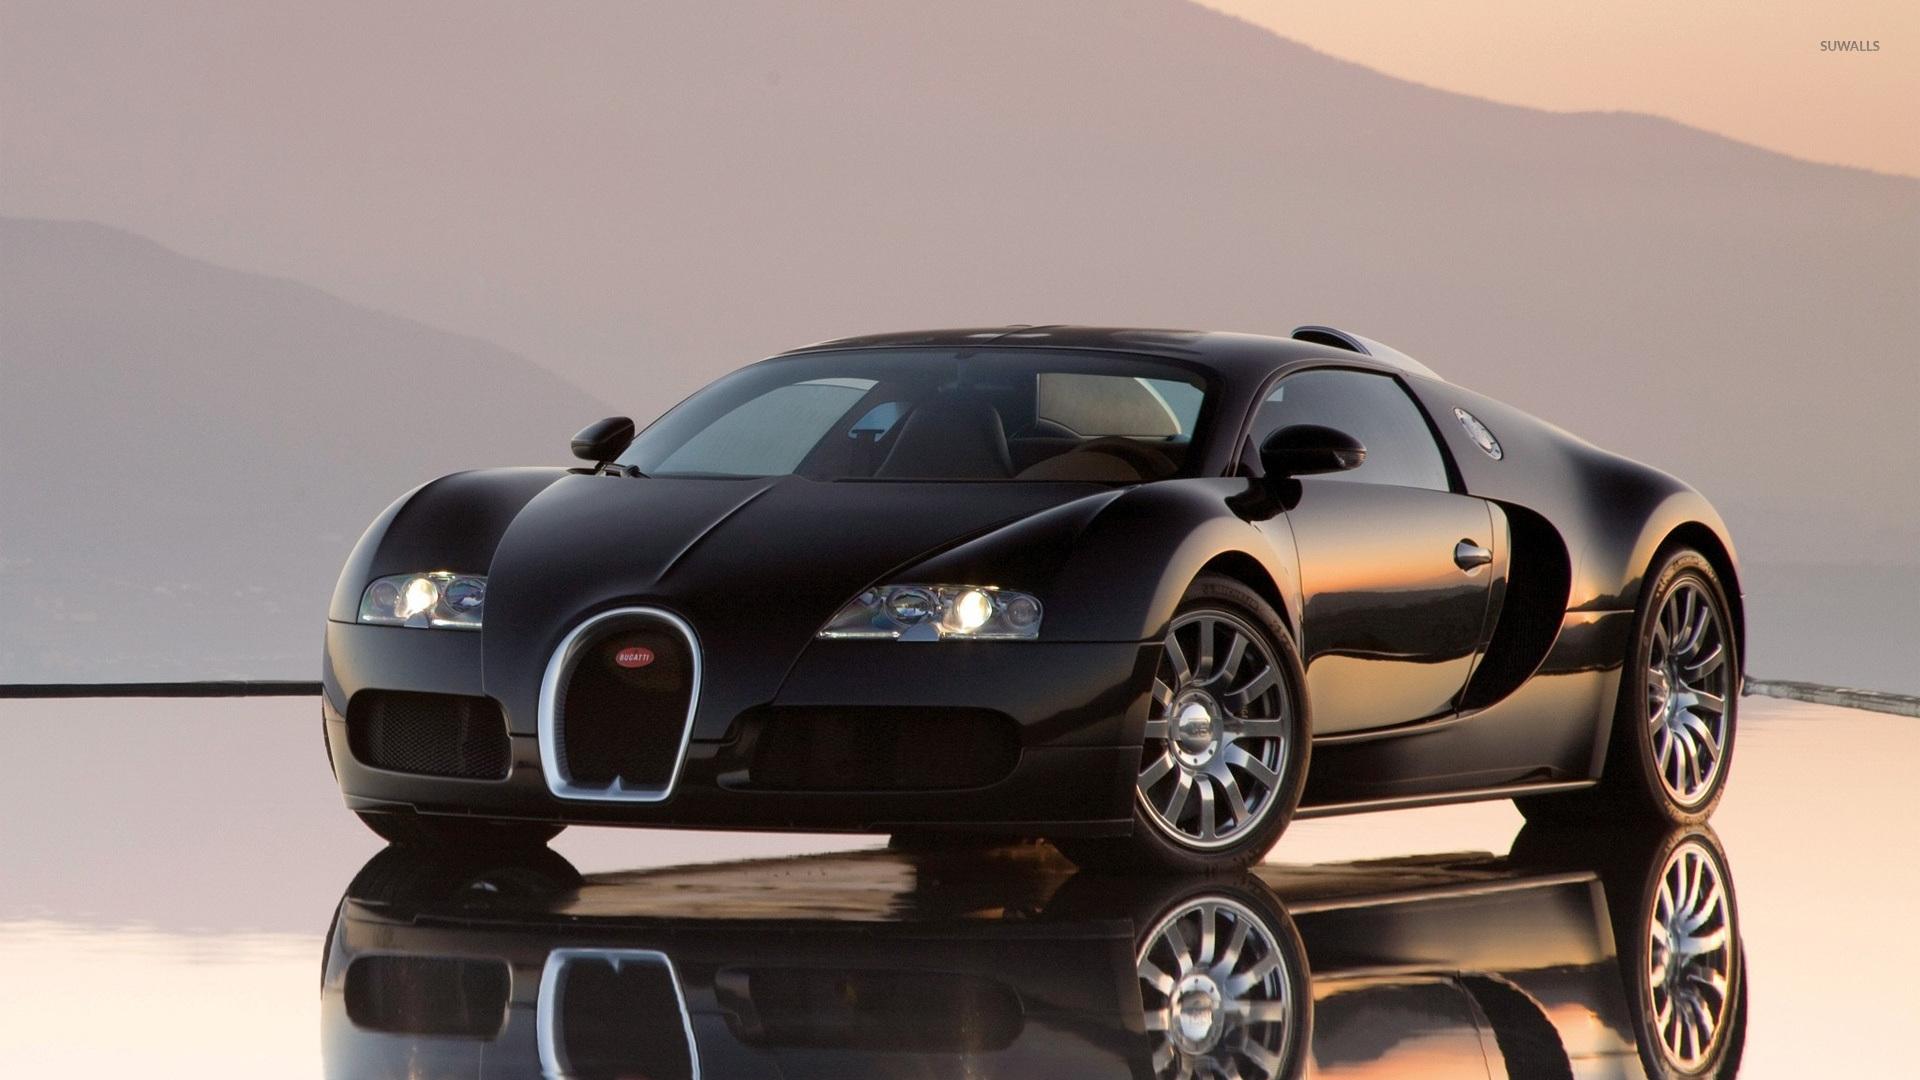 bugatti veyron eb 16 4 wallpaper car wallpapers 7884. Black Bedroom Furniture Sets. Home Design Ideas